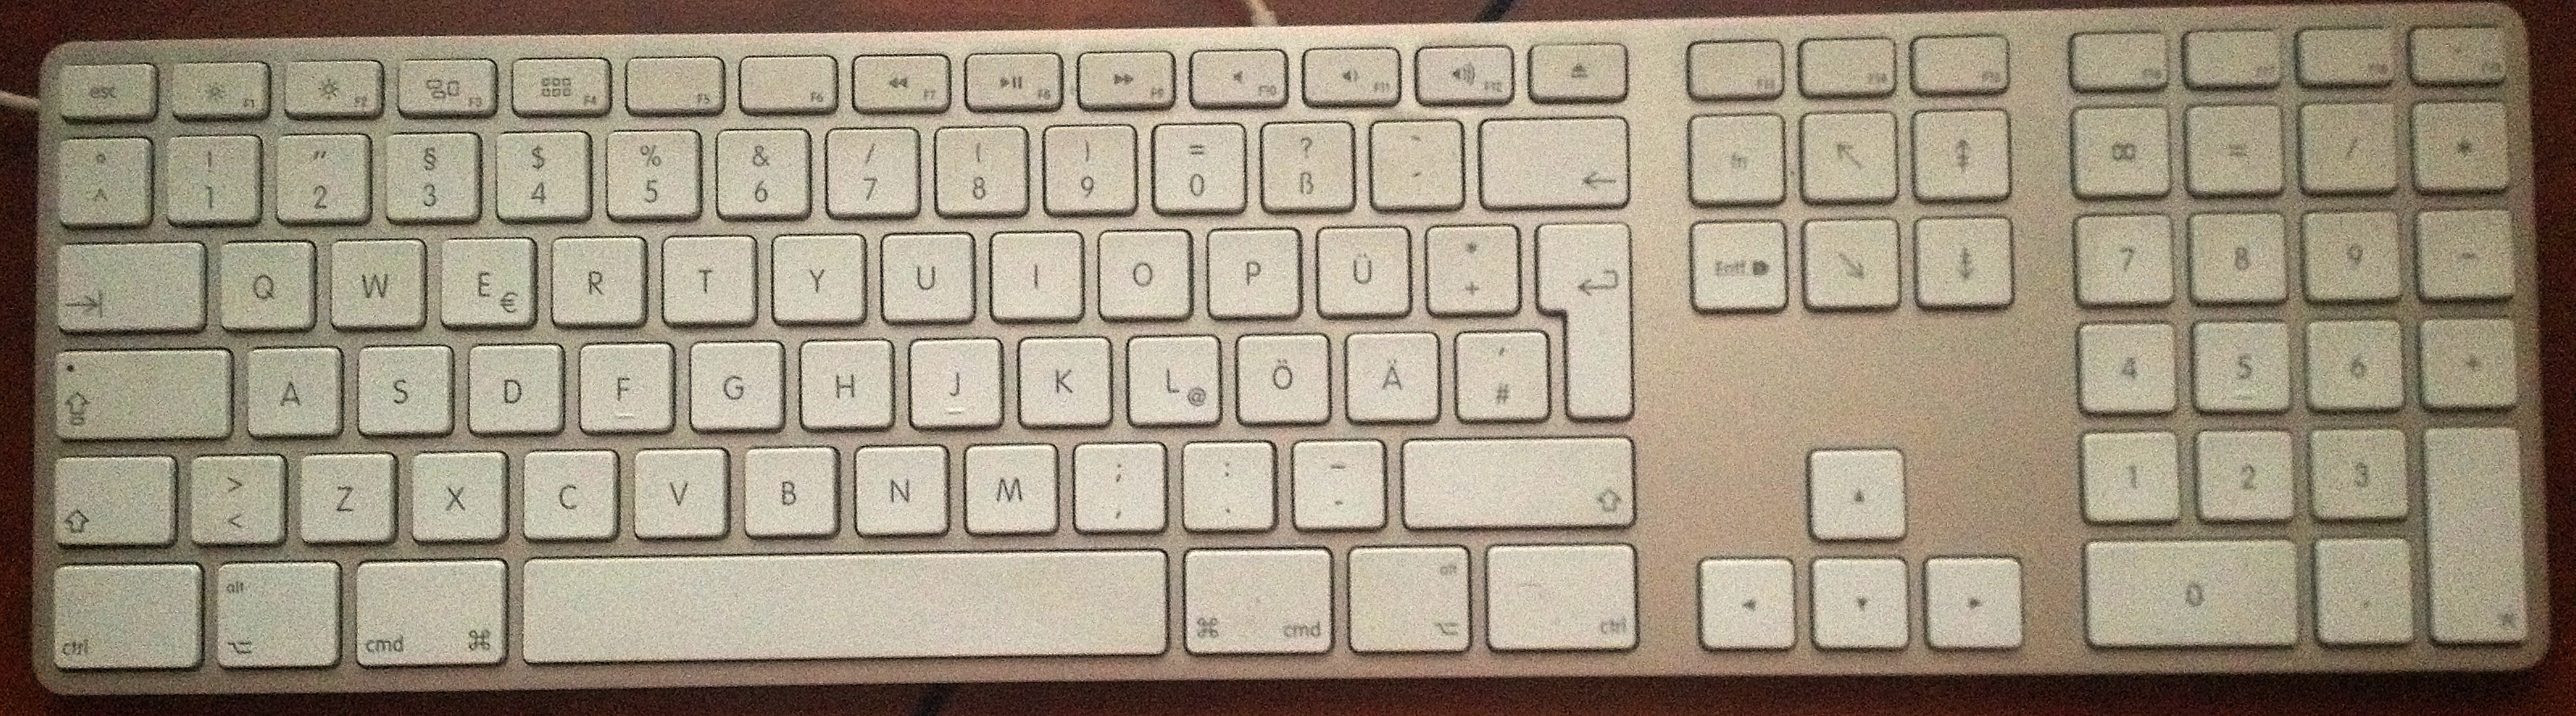 Can't type normal Tilde - Apple Community